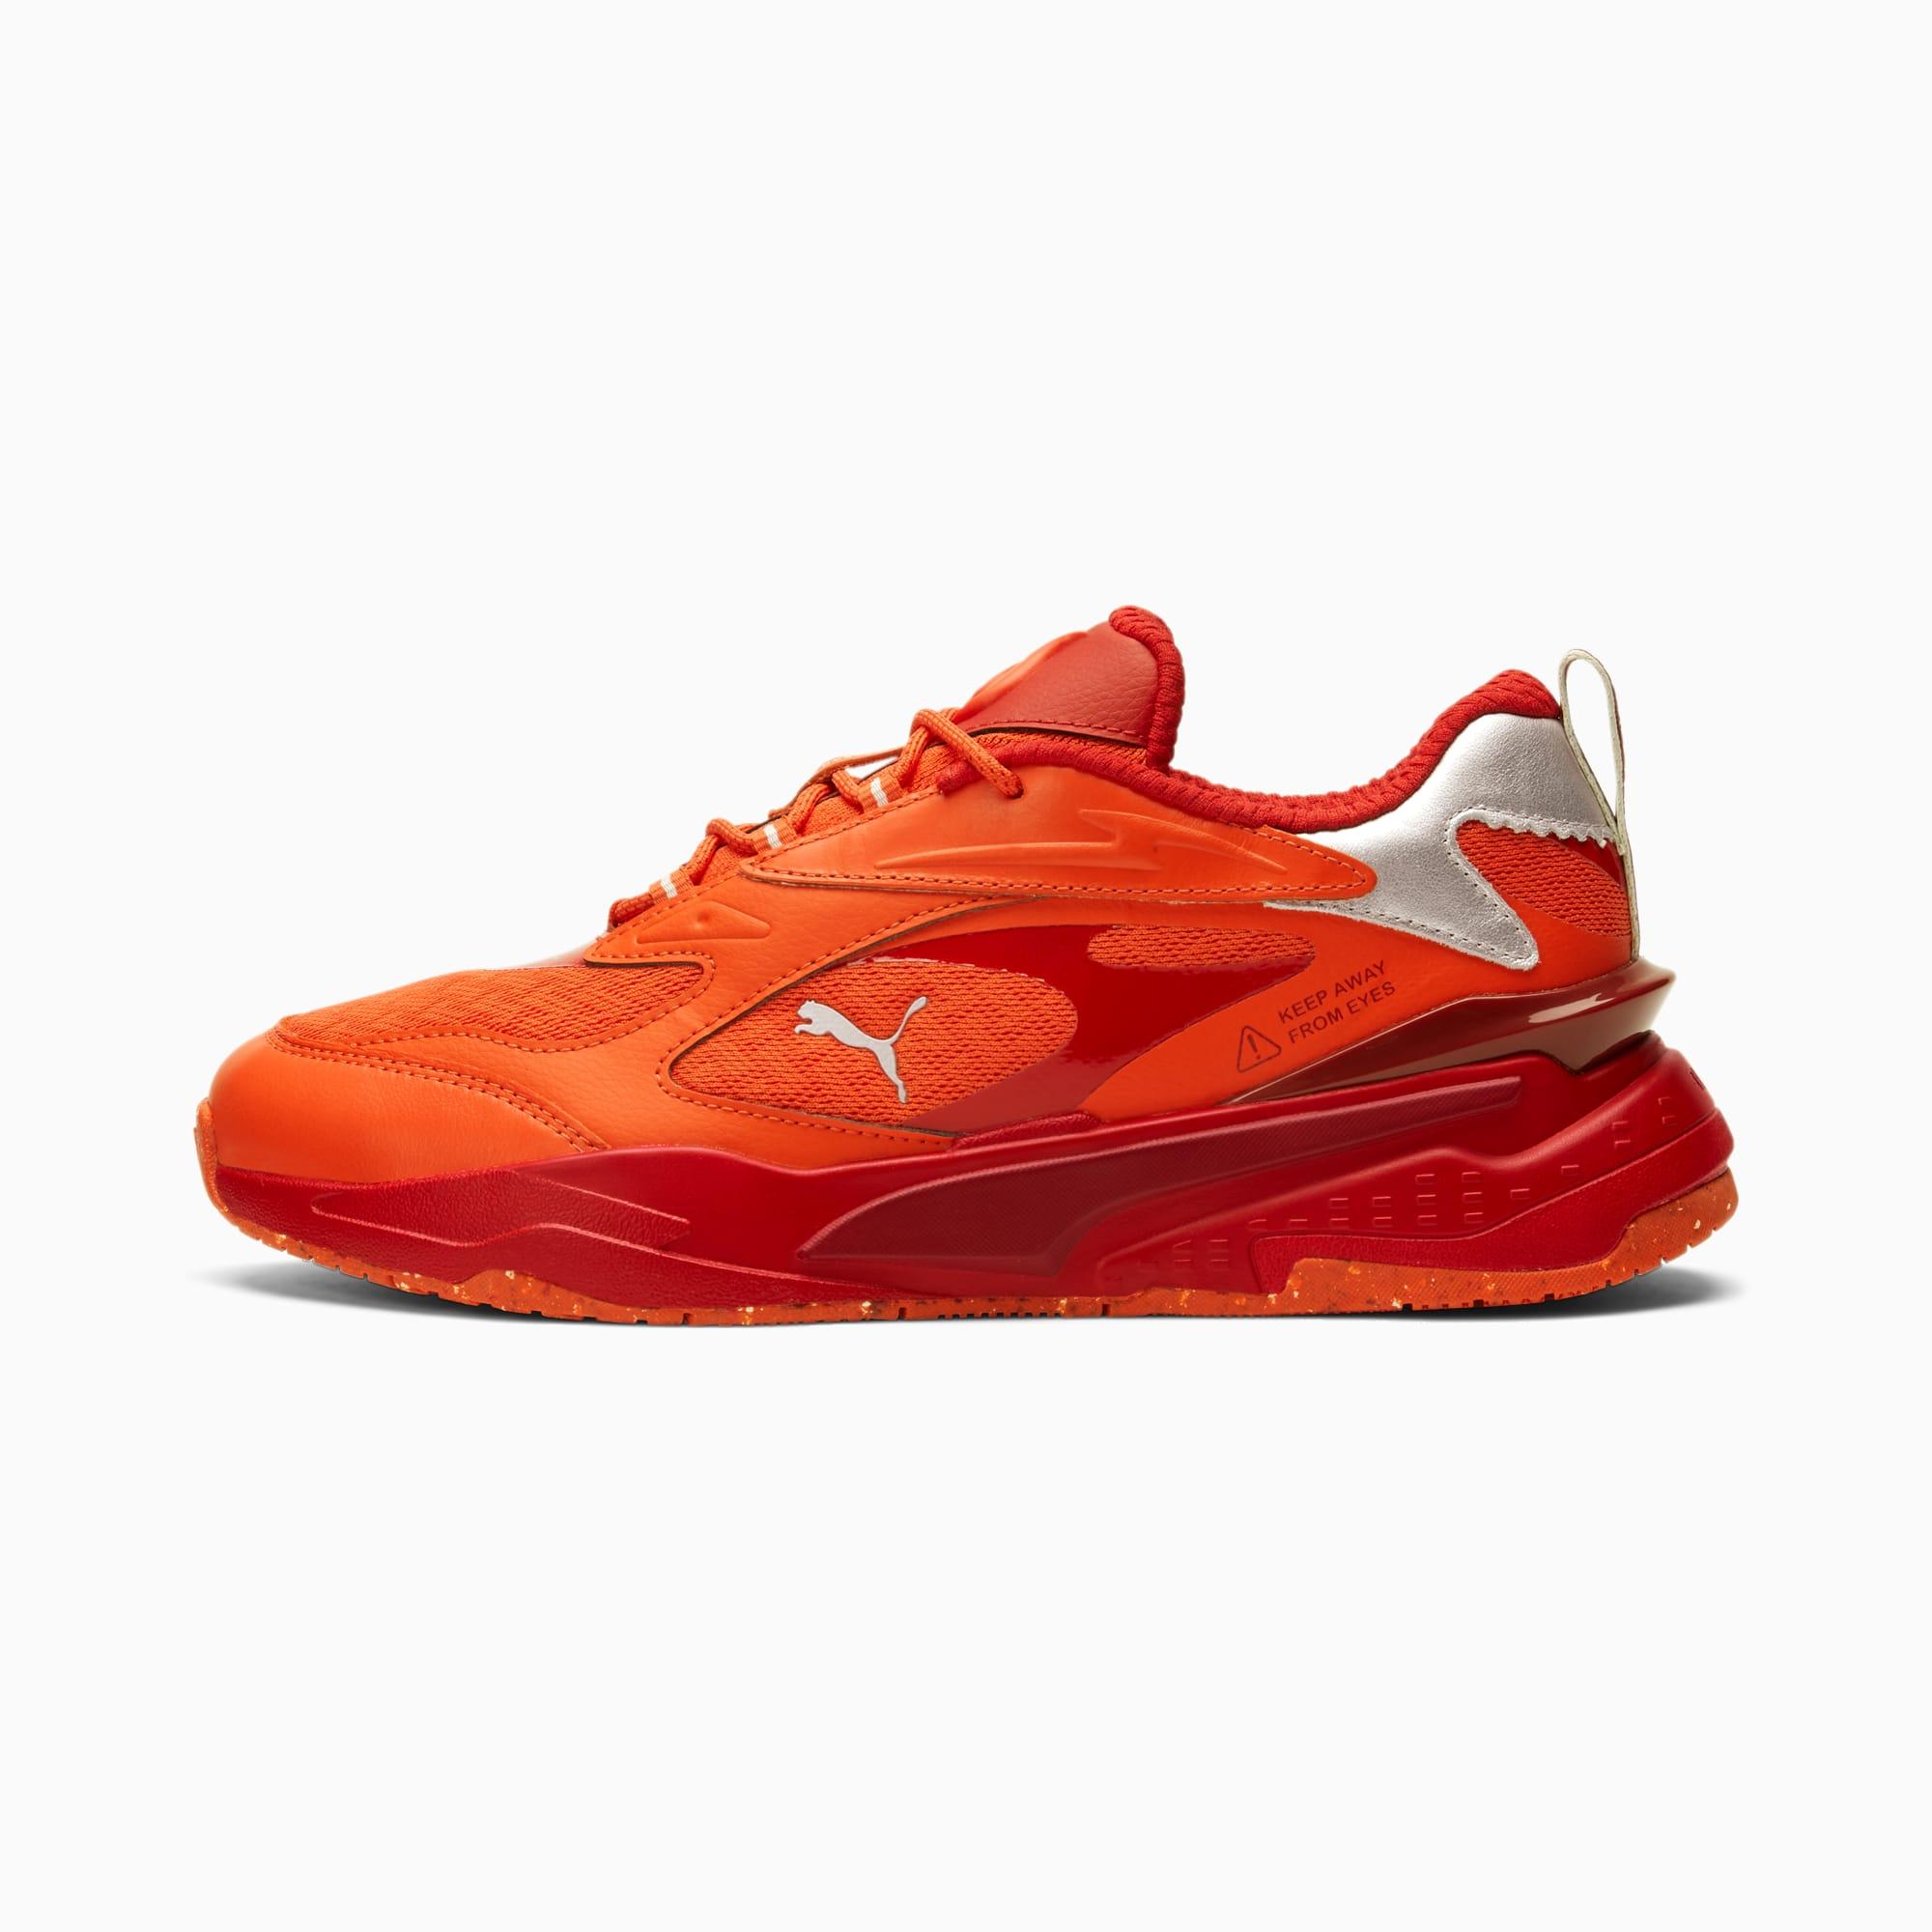 RS-Fast Caliente Sneakers